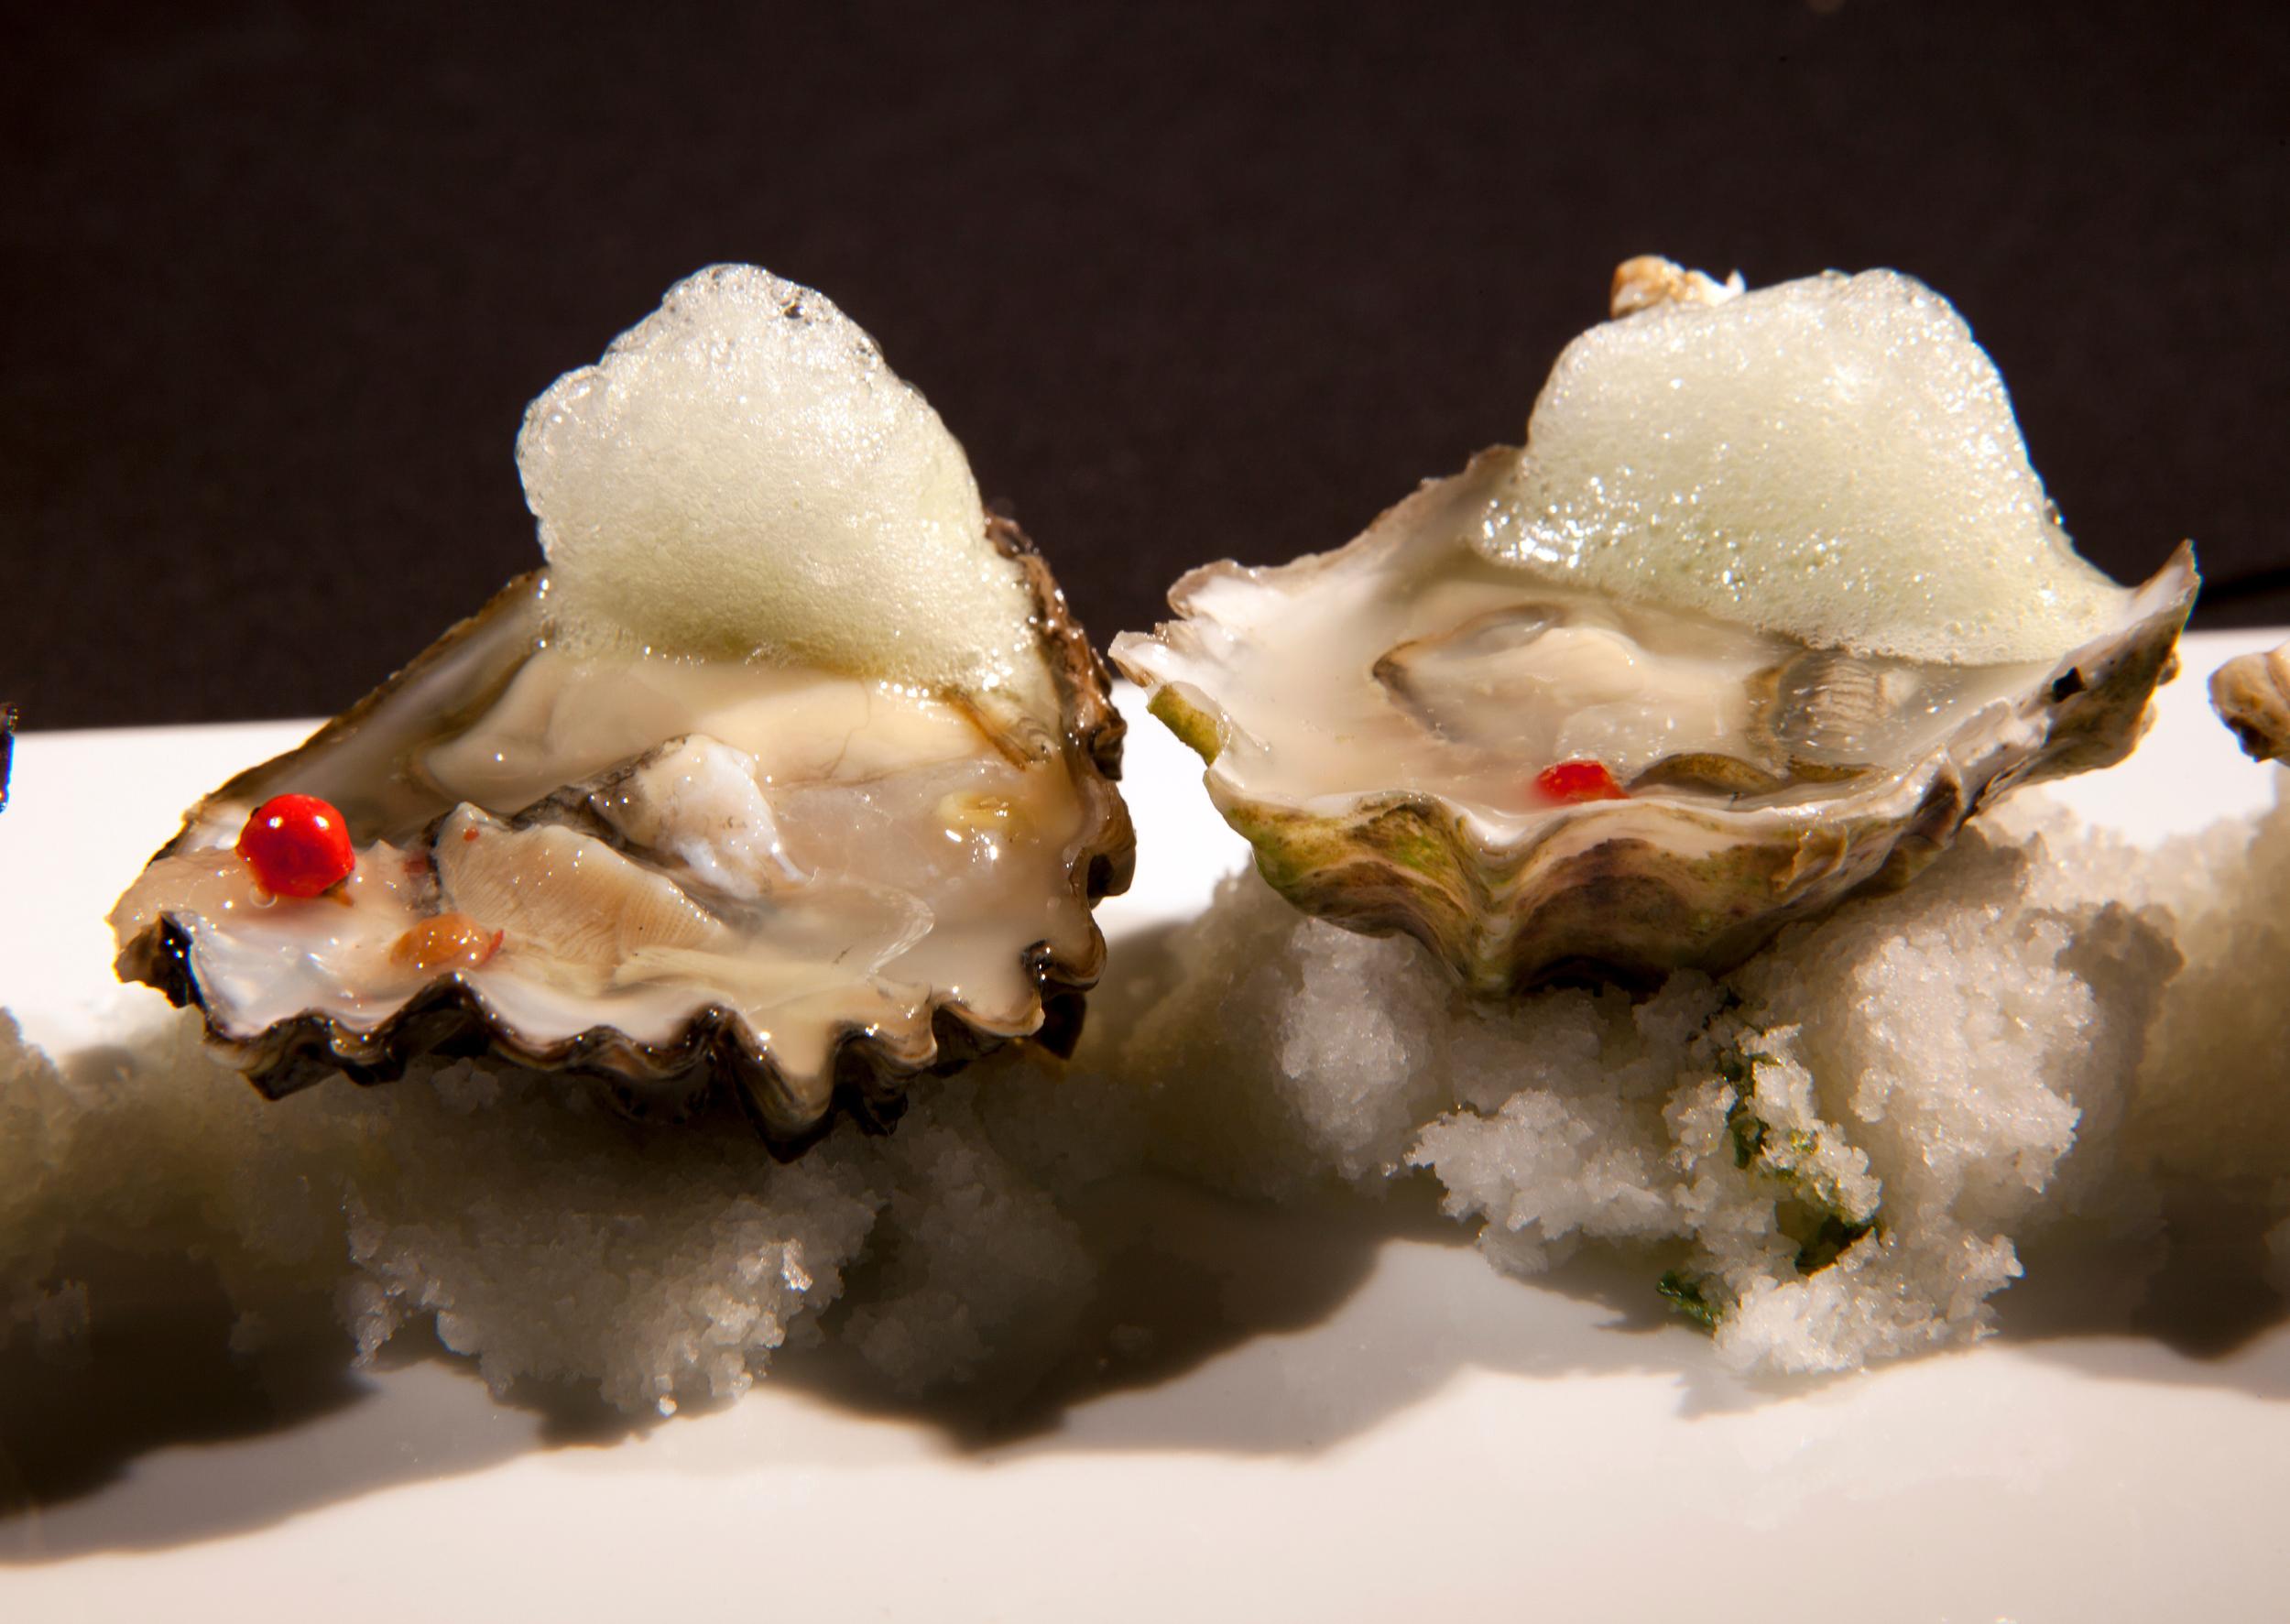 h5o_oysters.jpg